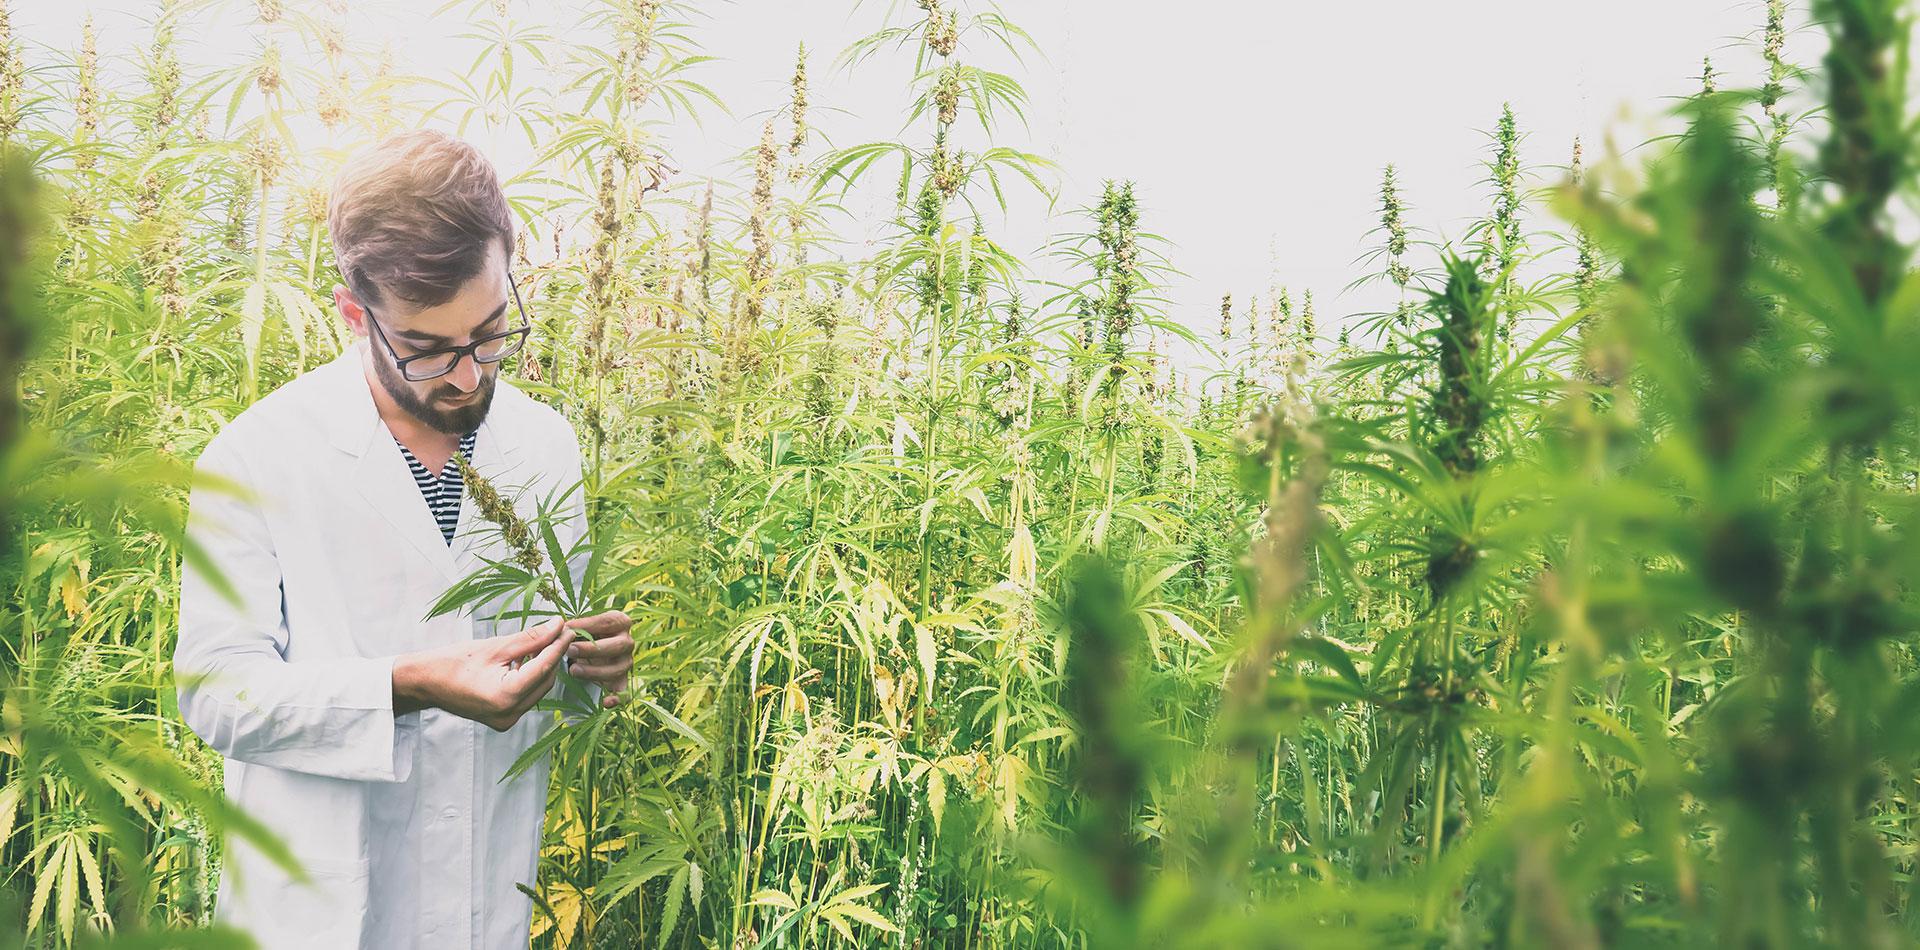 Scientist - Marijuana